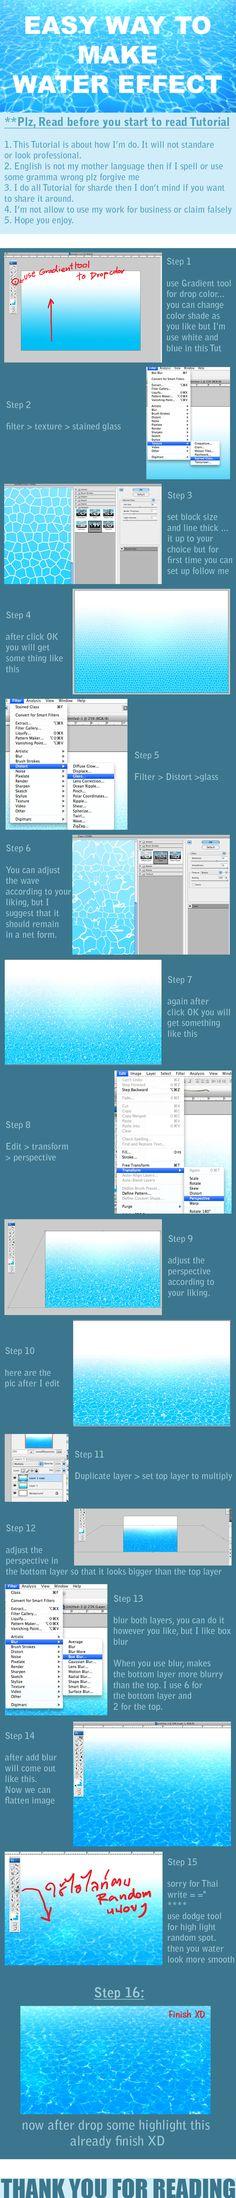 http://fc08.deviantart.net/fs70/f/2012/339/d/a/easy_way_to_make_water__3__by_pandabaka-d5n5dcj.jpg